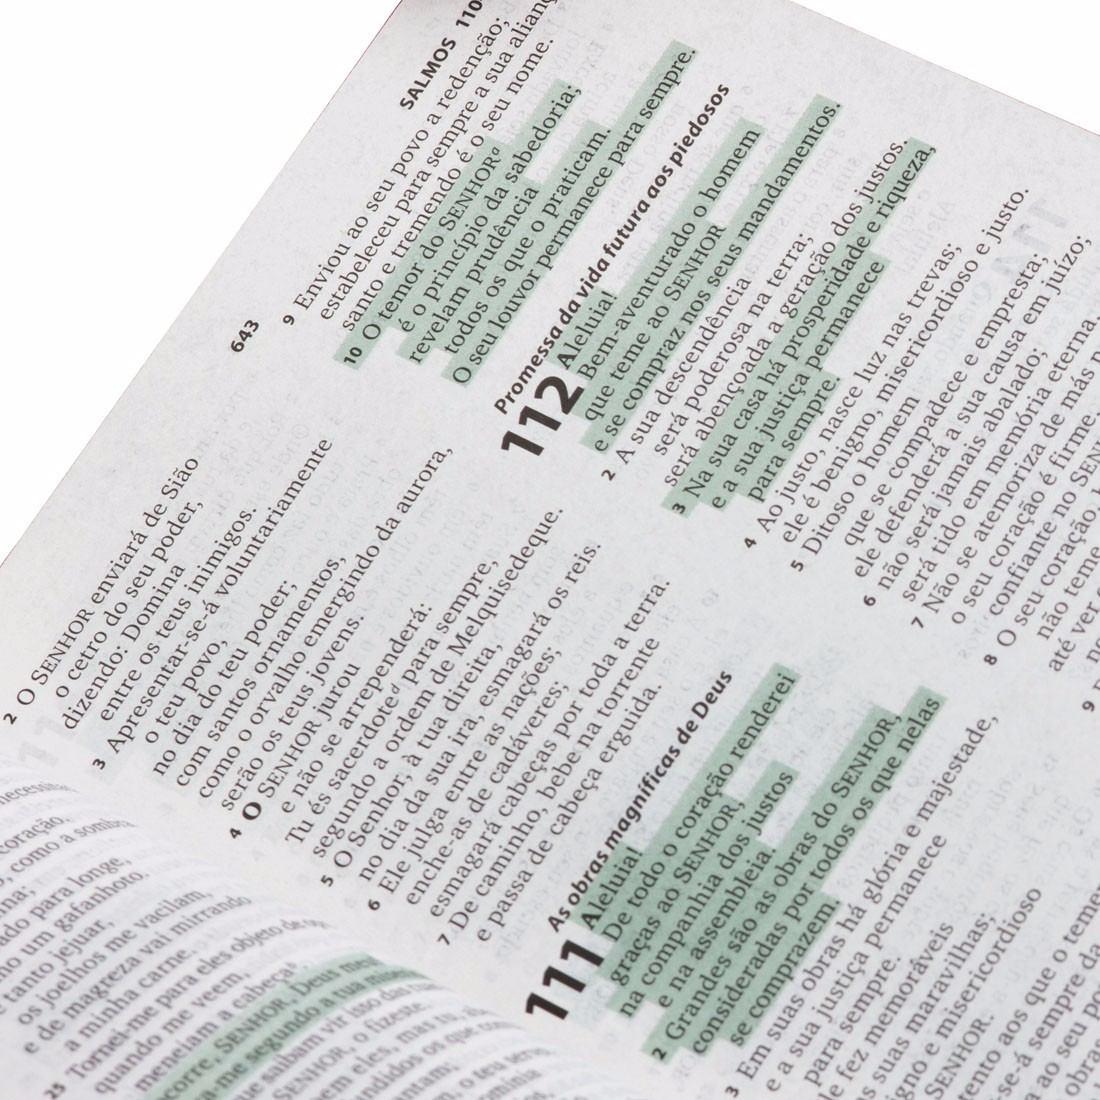 Biblia sagrada em portugues joao ferreira almeida